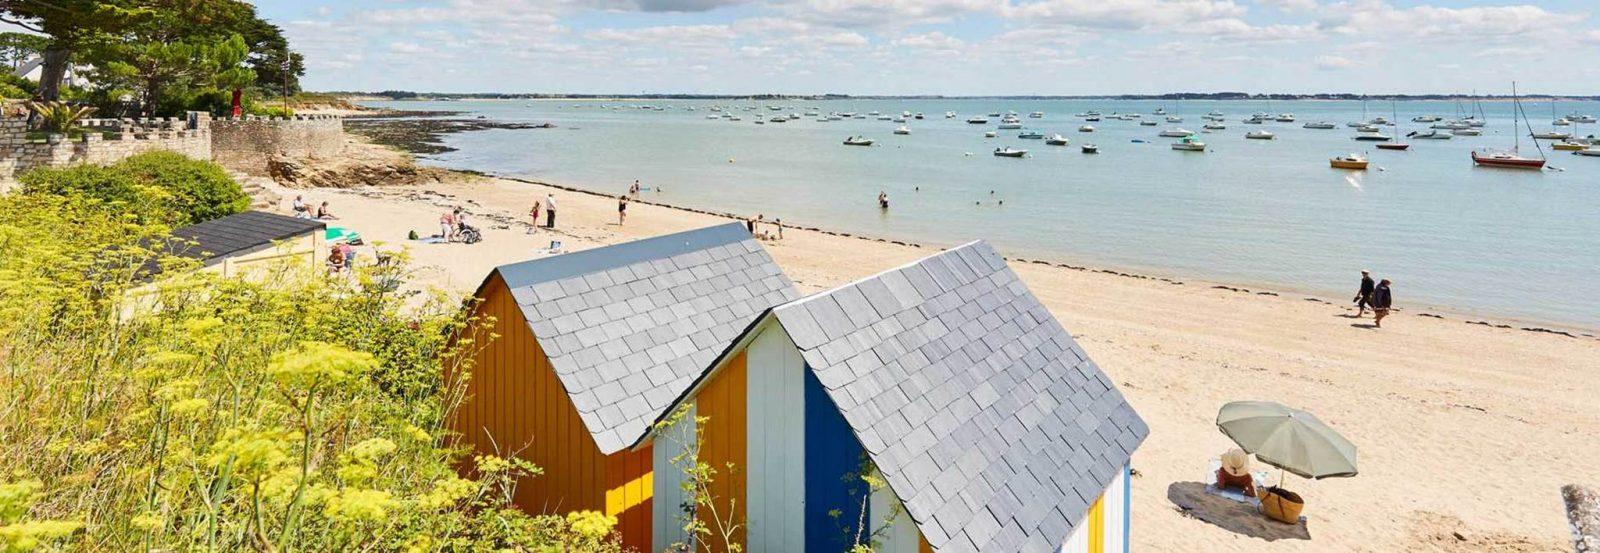 Petite plage de Kervoyal Damgan Morbihan